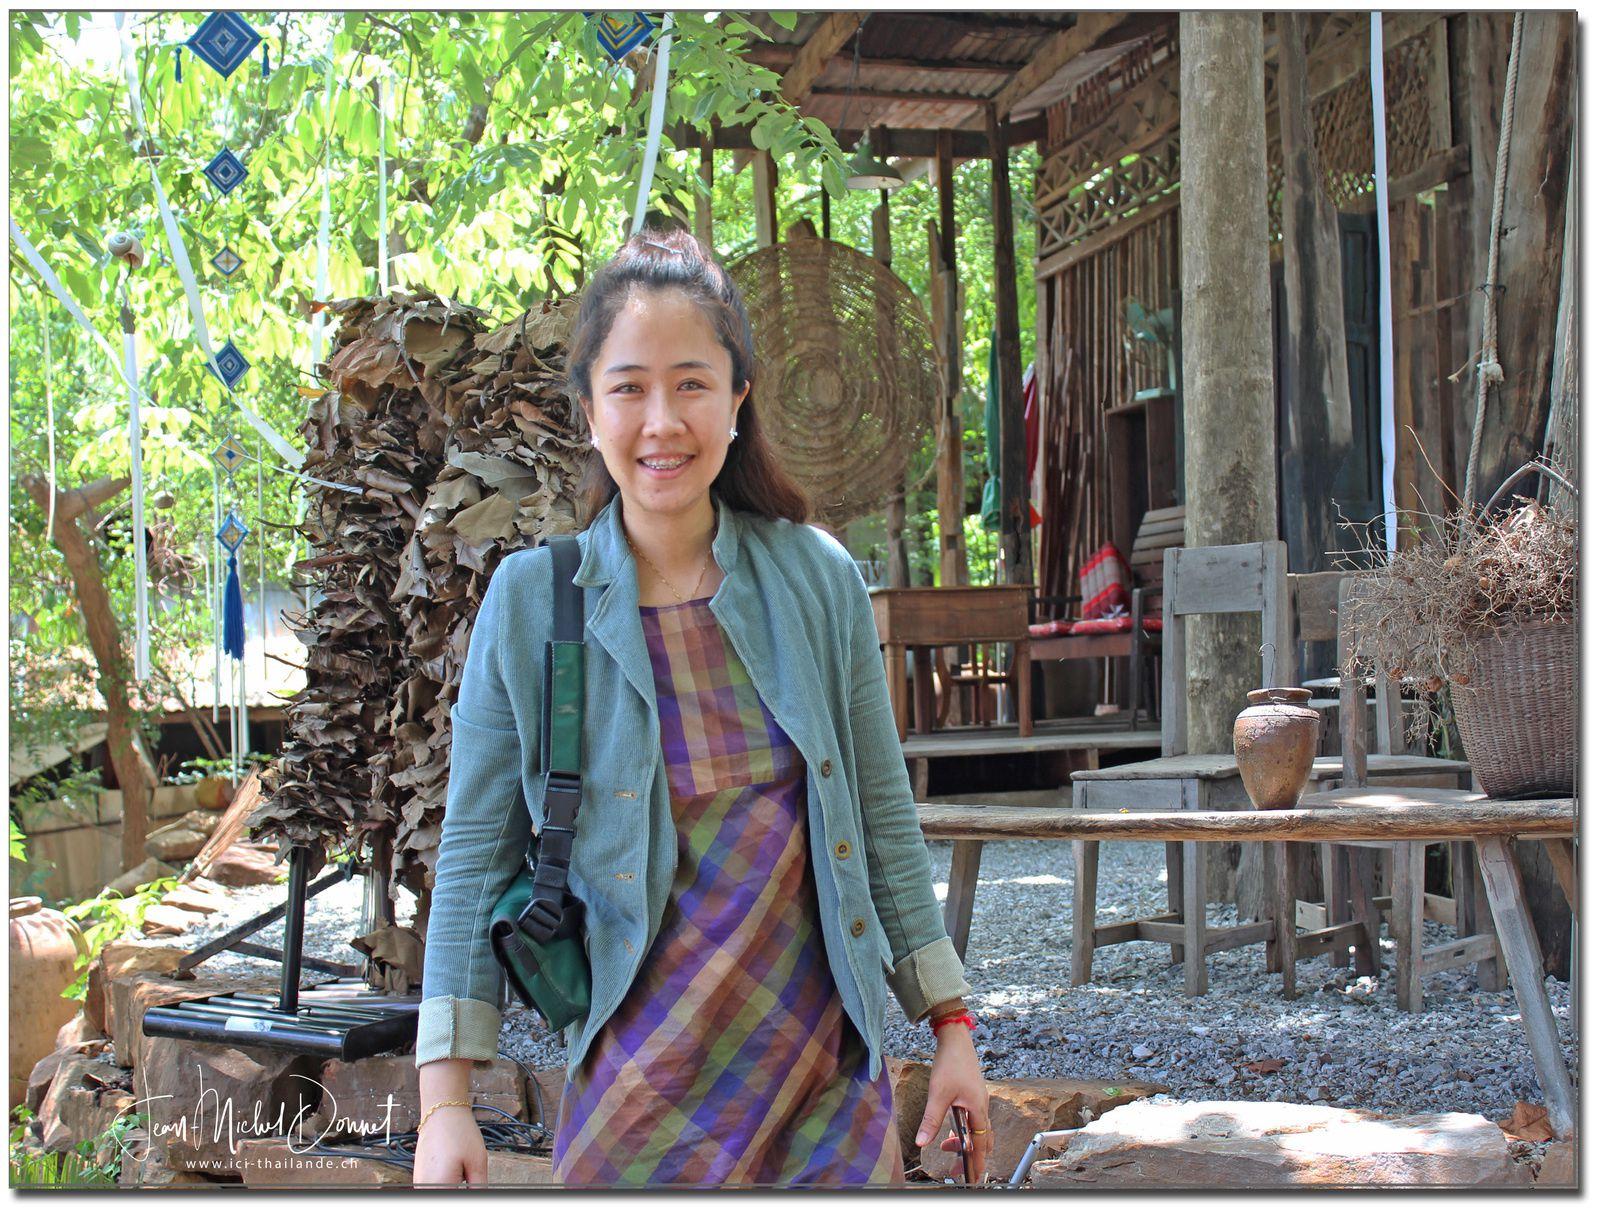 L'heure du café.... (Thaïlande, Ubonrat)